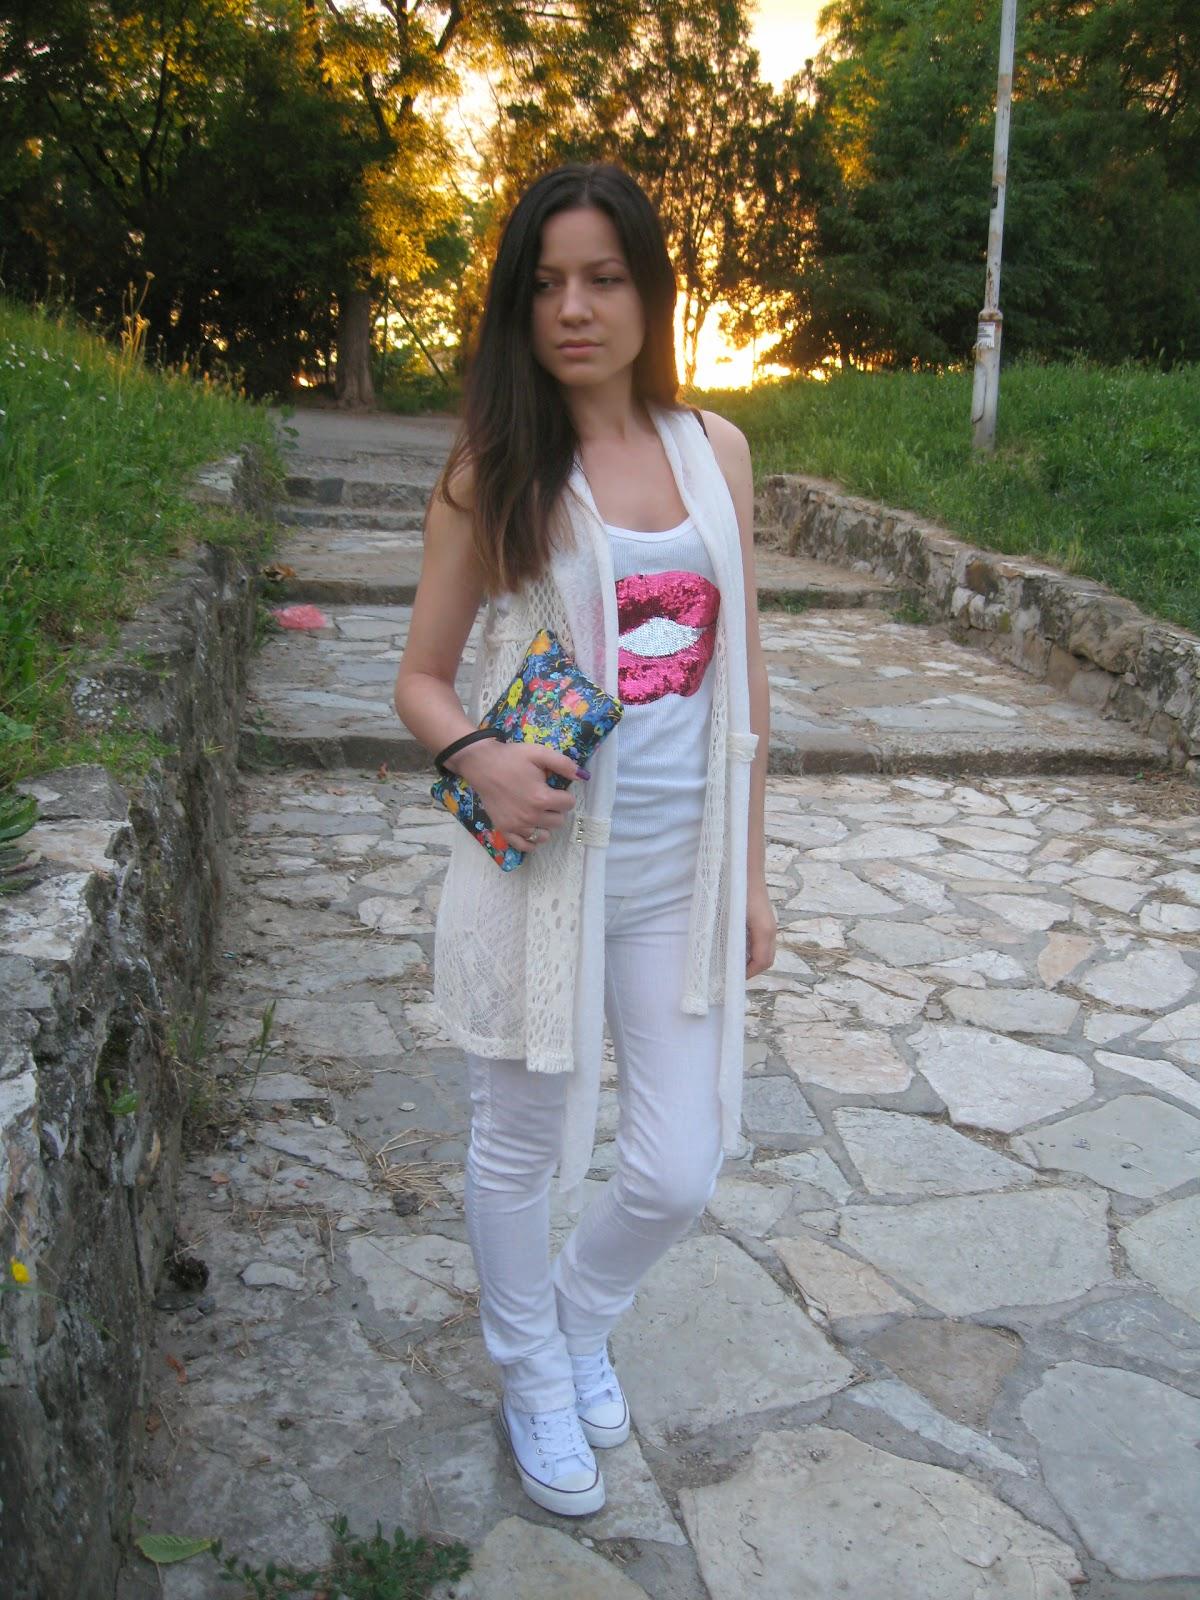 deichmann white sneakers, white sneakers, white converse, white jeans, white crochet vest, white tank top, zara floral clutch, kiss print t-shirt, all white look